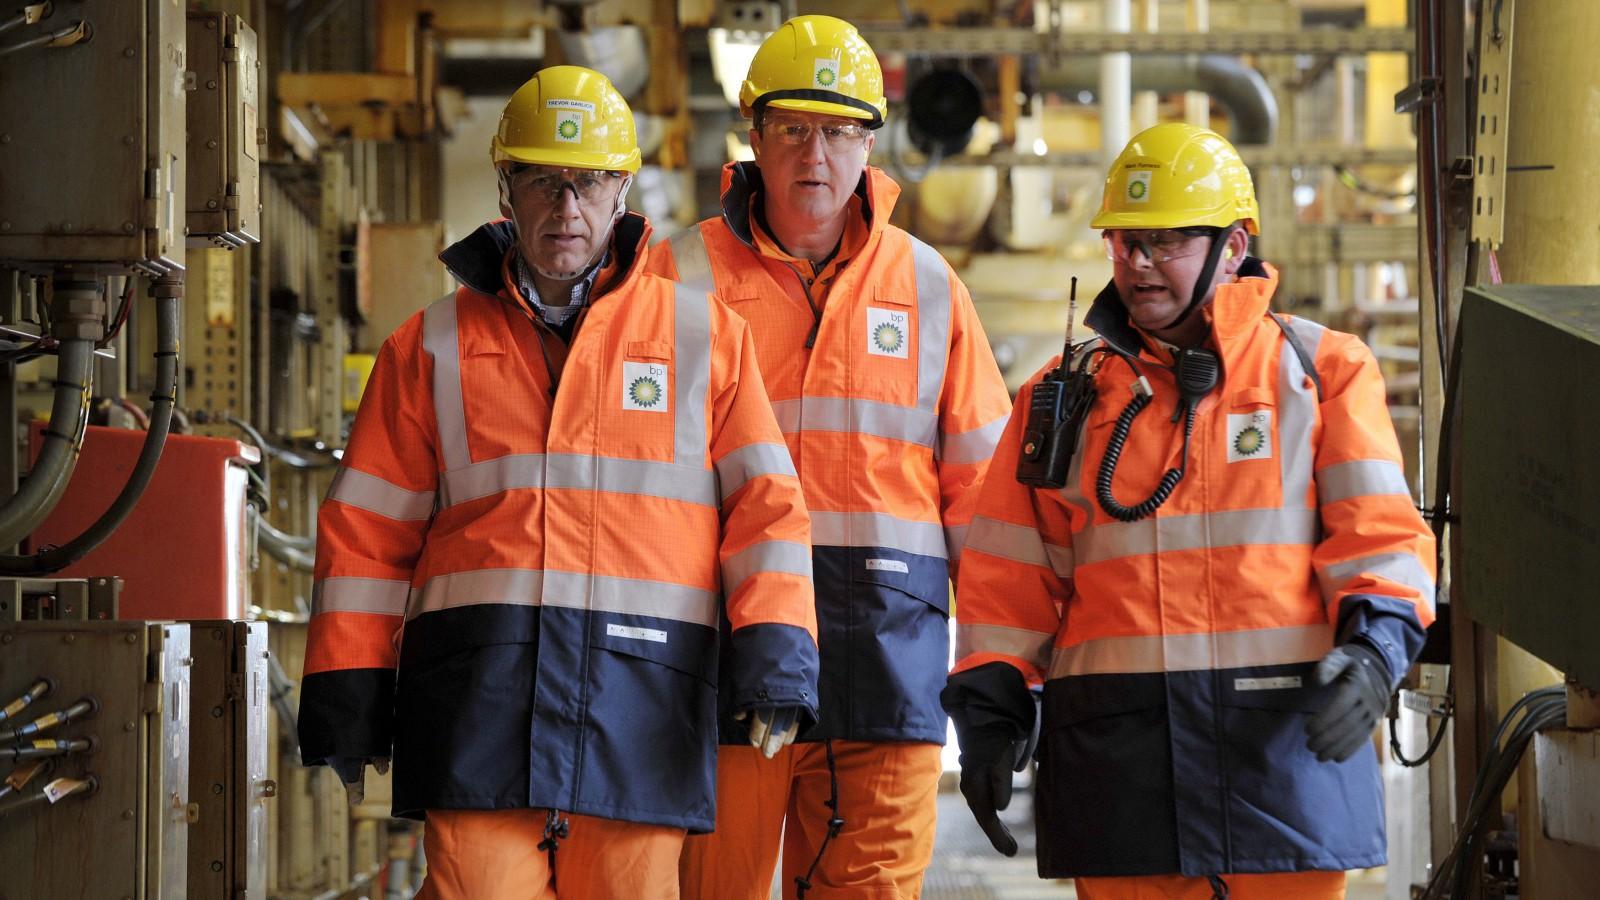 Britain's Prime Minister David Cameron (C) walks with BP regional president North Sea Trevor Garlick